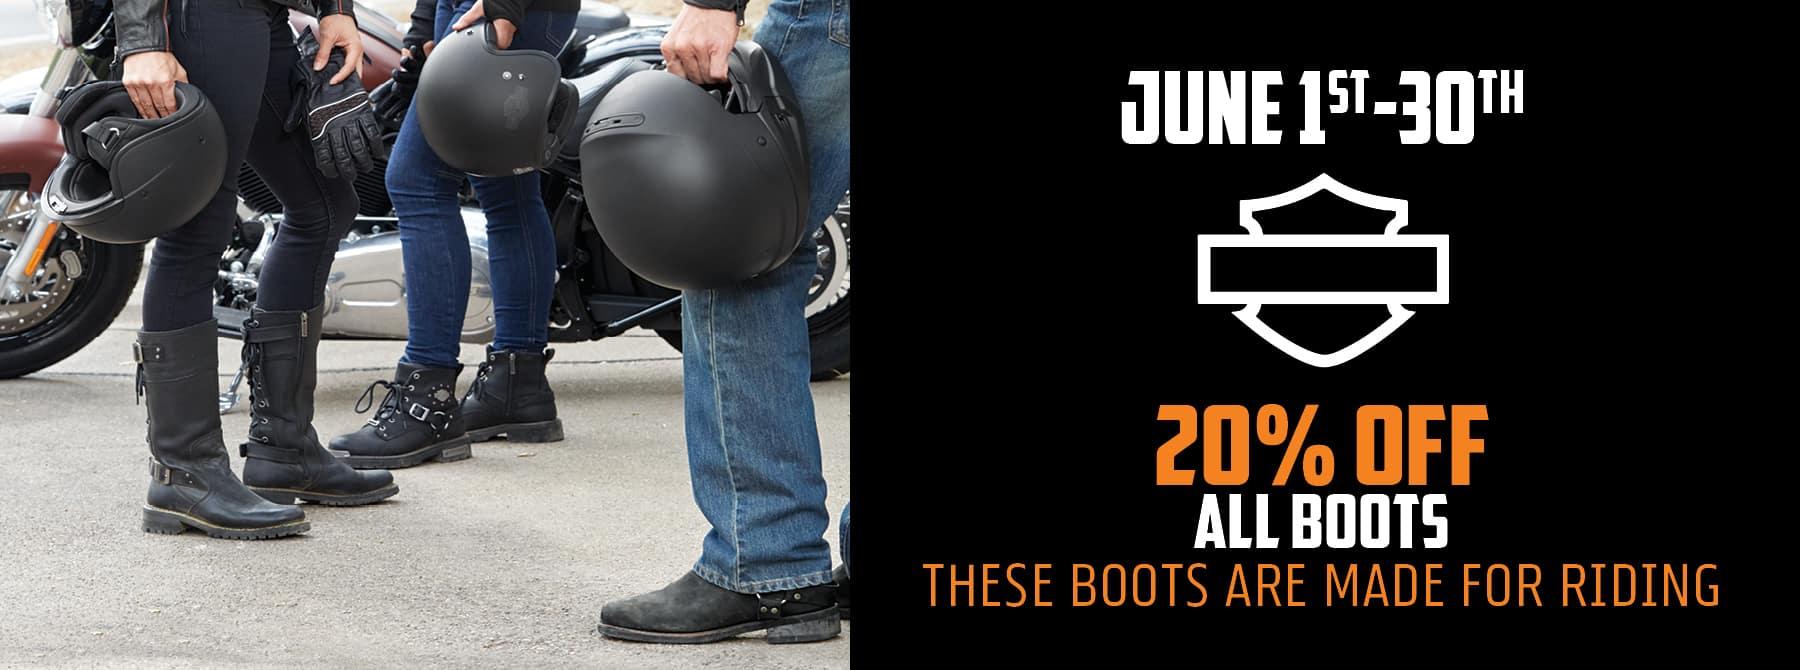 CA01_06_21_June_Boot_Special_1800x670_Rotator